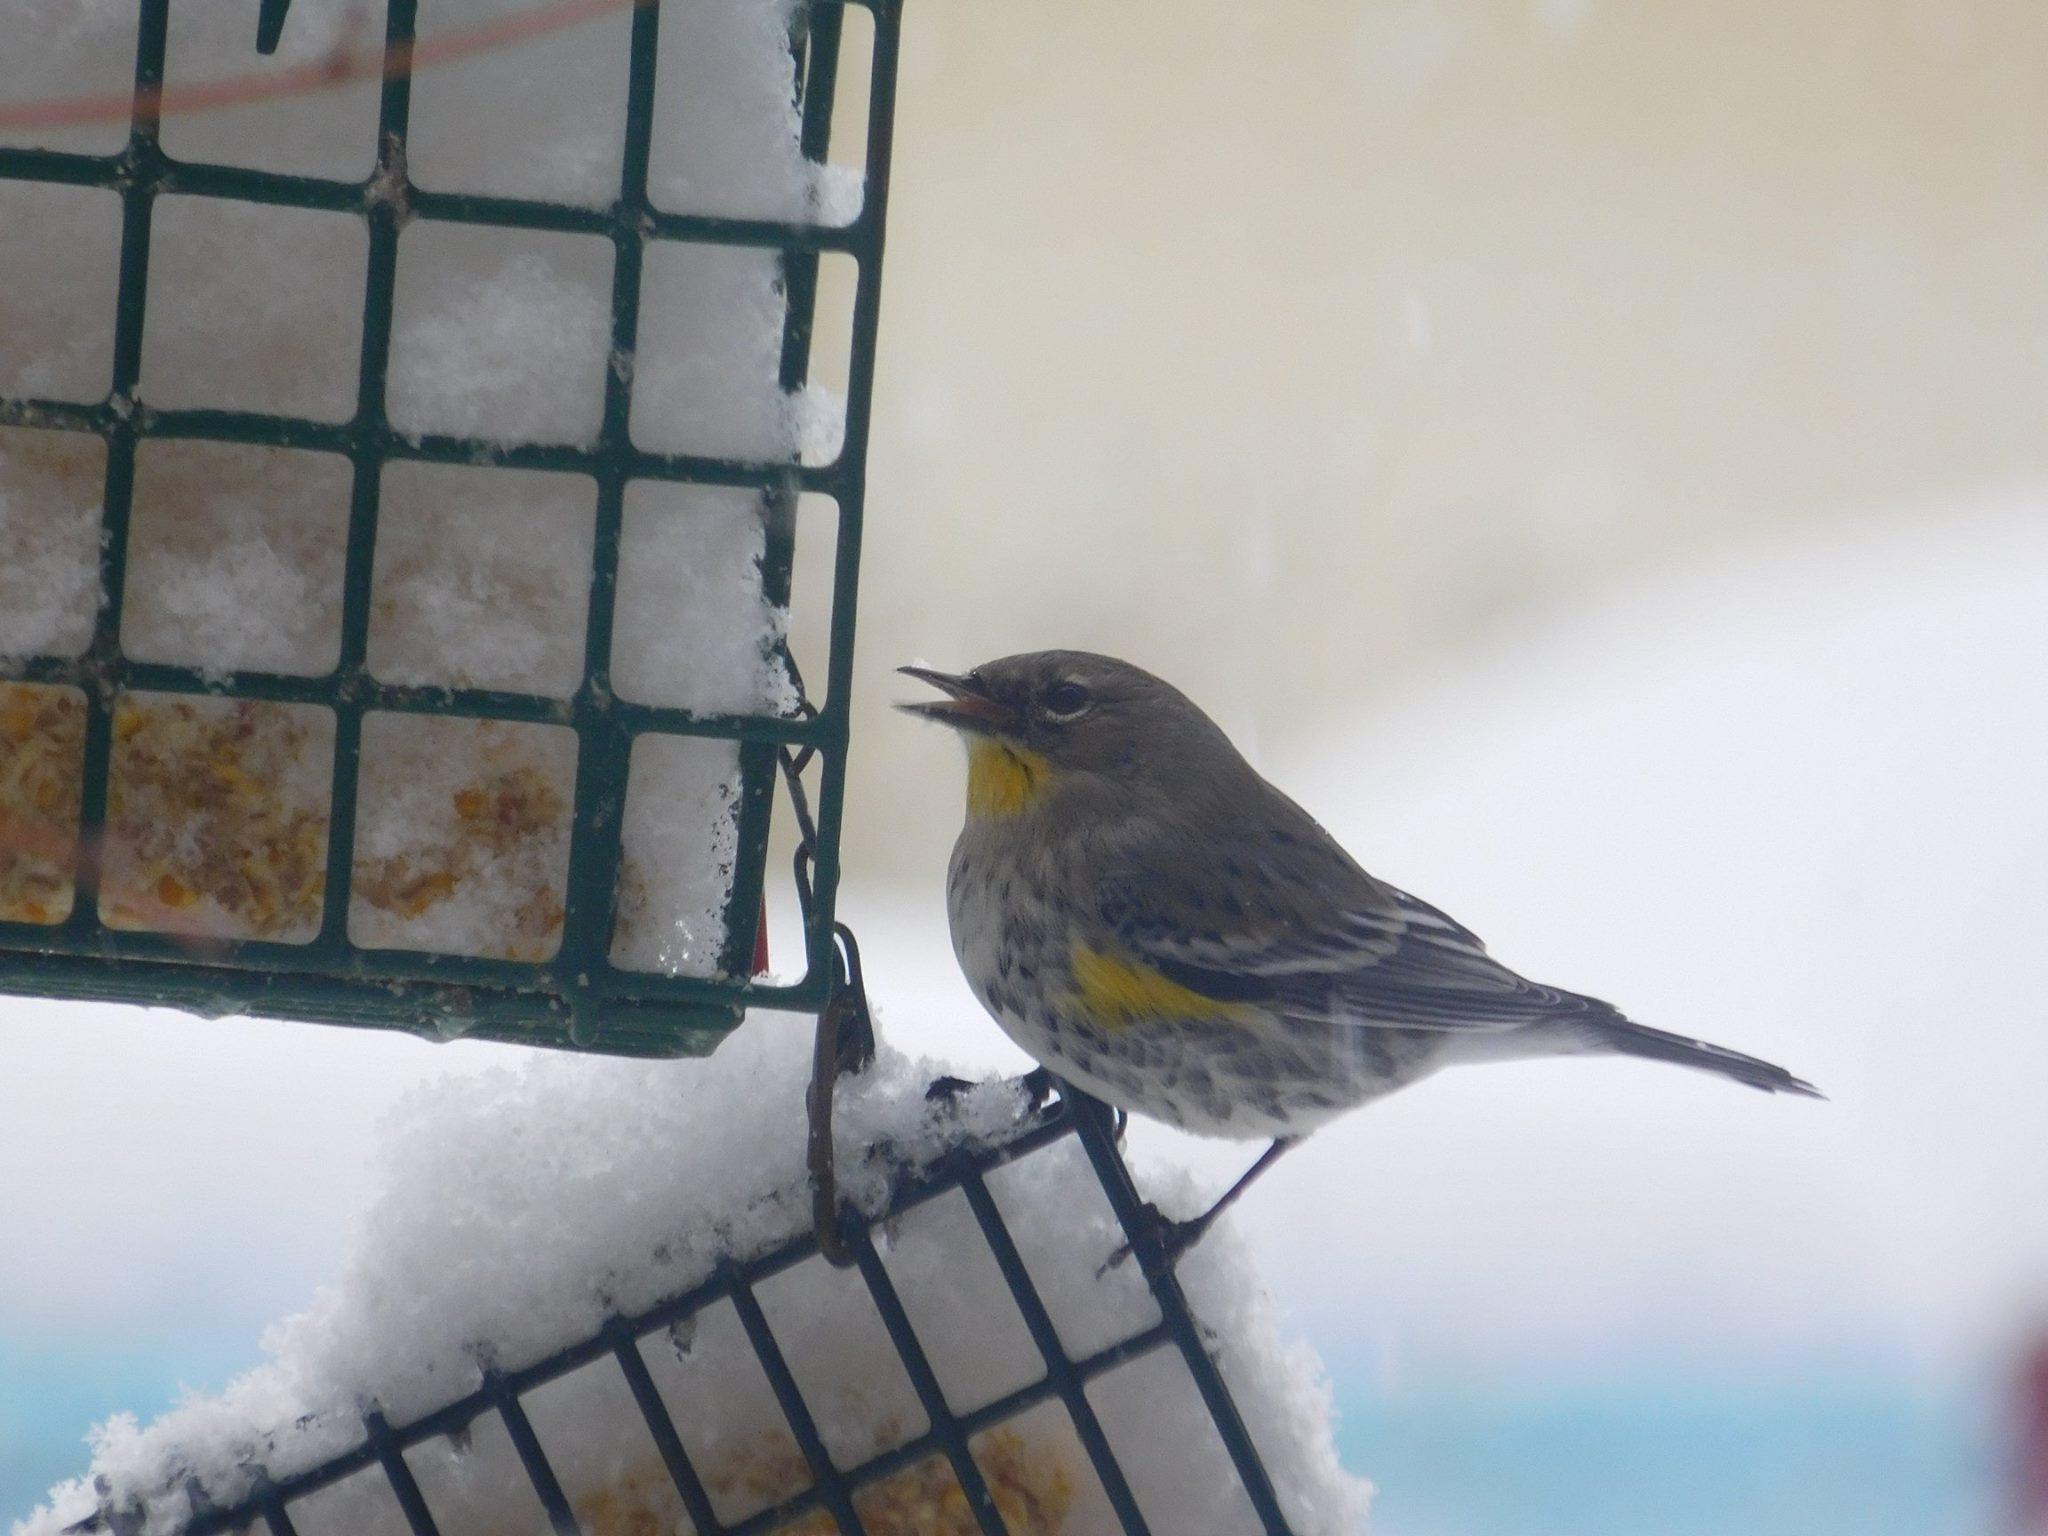 attracting backyard birds topeka u0026 shawnee county public library